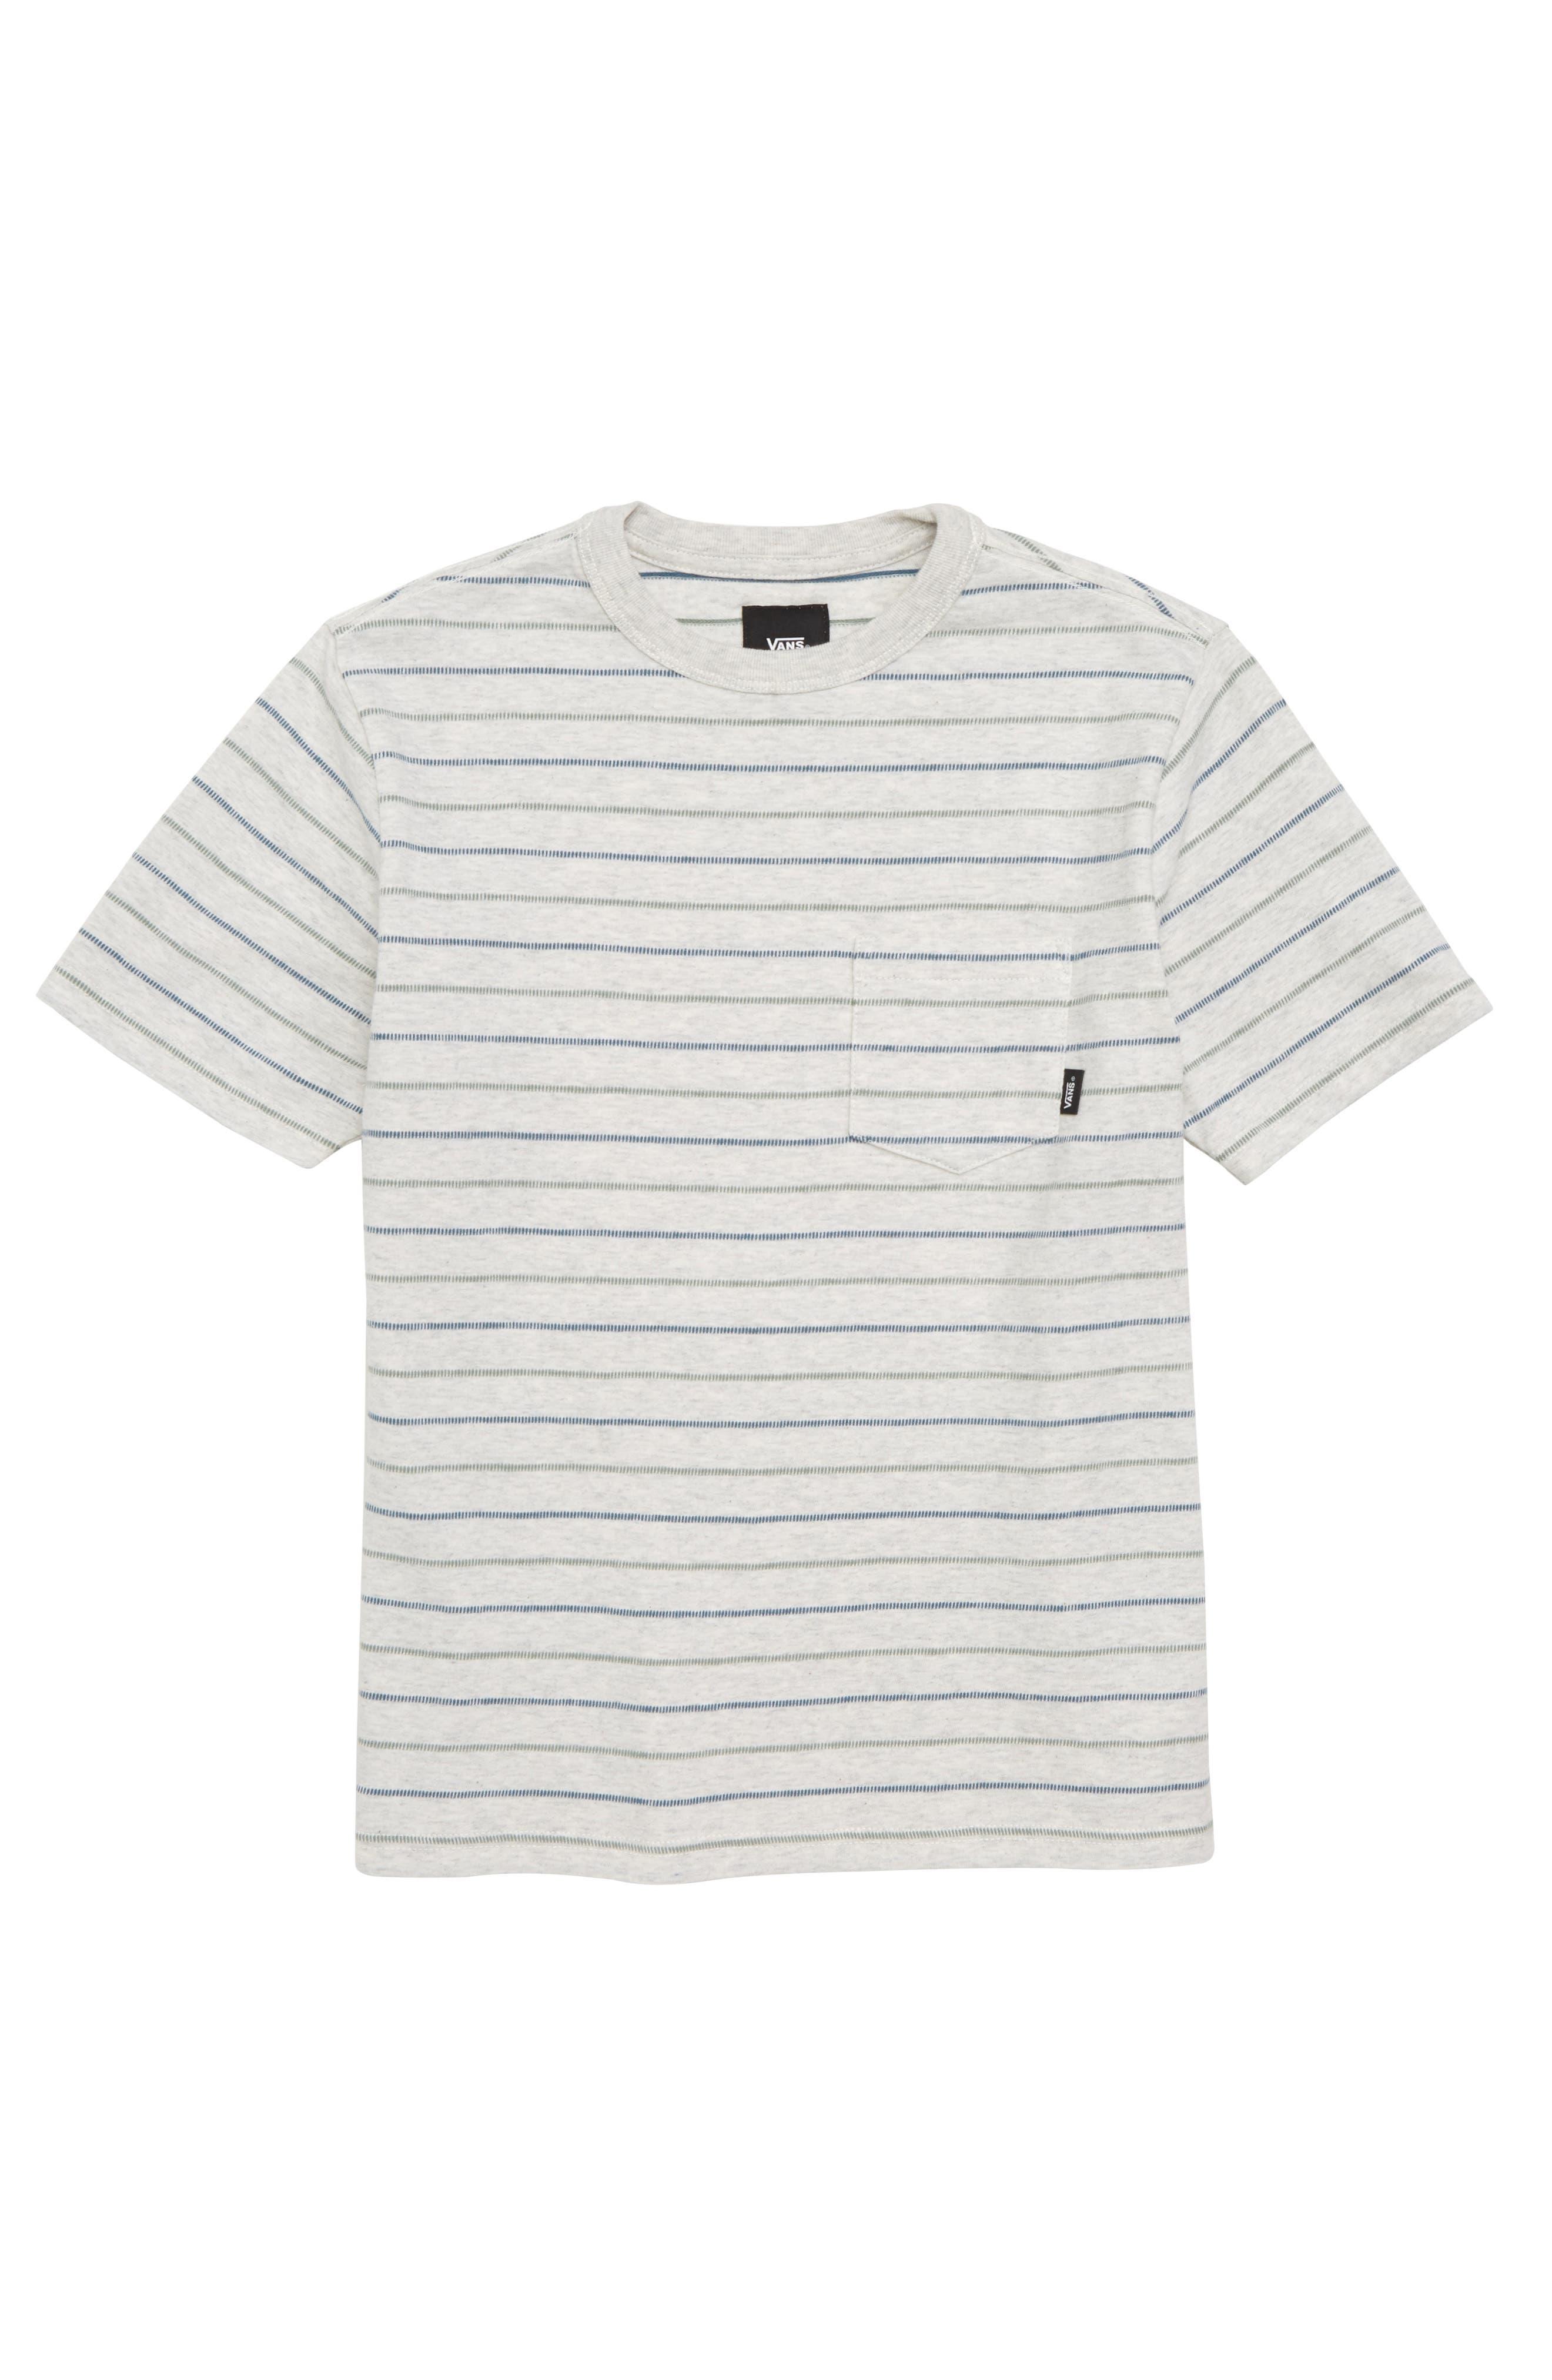 Strikemont III T-Shirt,                         Main,                         color, Ash Heather